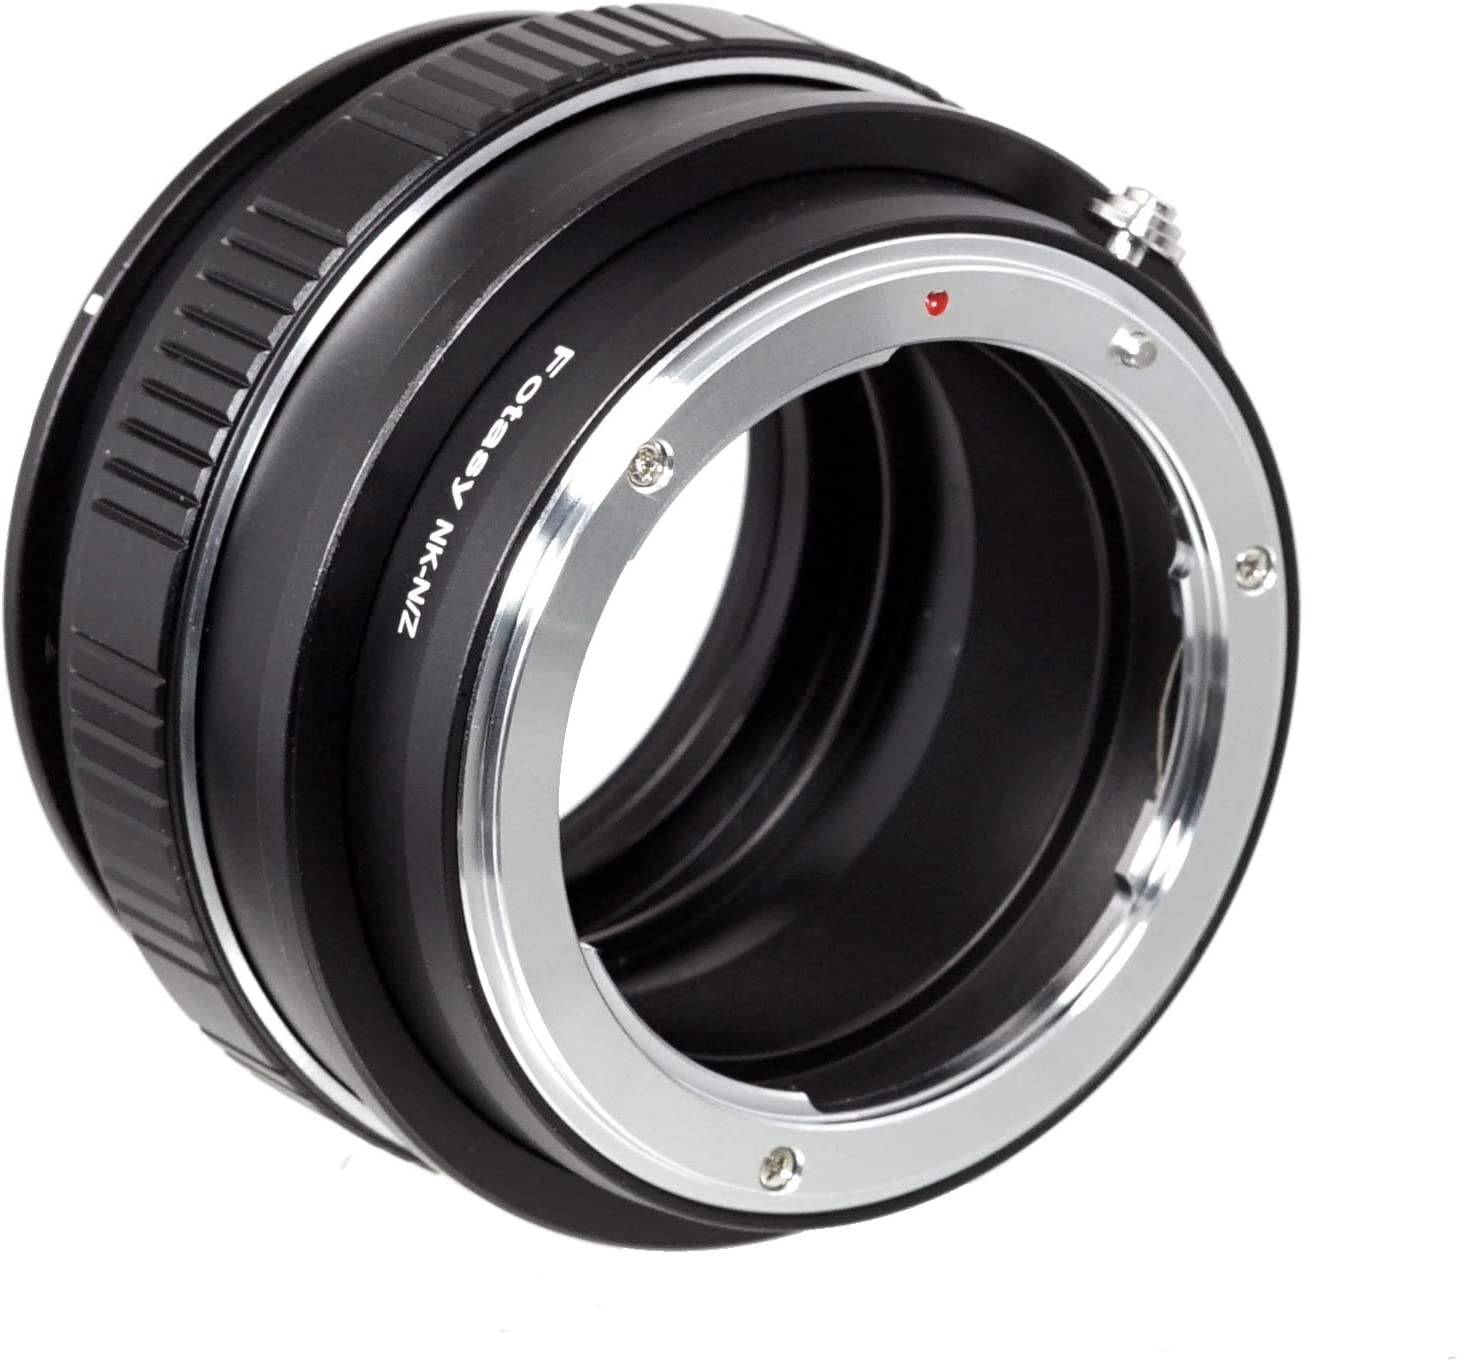 Adaptall-2 Mount to Nikon Z Mount Adapter Adaptall-2 NZ Adapter fits Tamron Adaptall II Lens /& Nikon Z Mount Mirrorless Camera Z50 Z6 Z7 Fotasy Tamron Adaptall II Lens to Nikon Z50 Z6 Z7 Adapter